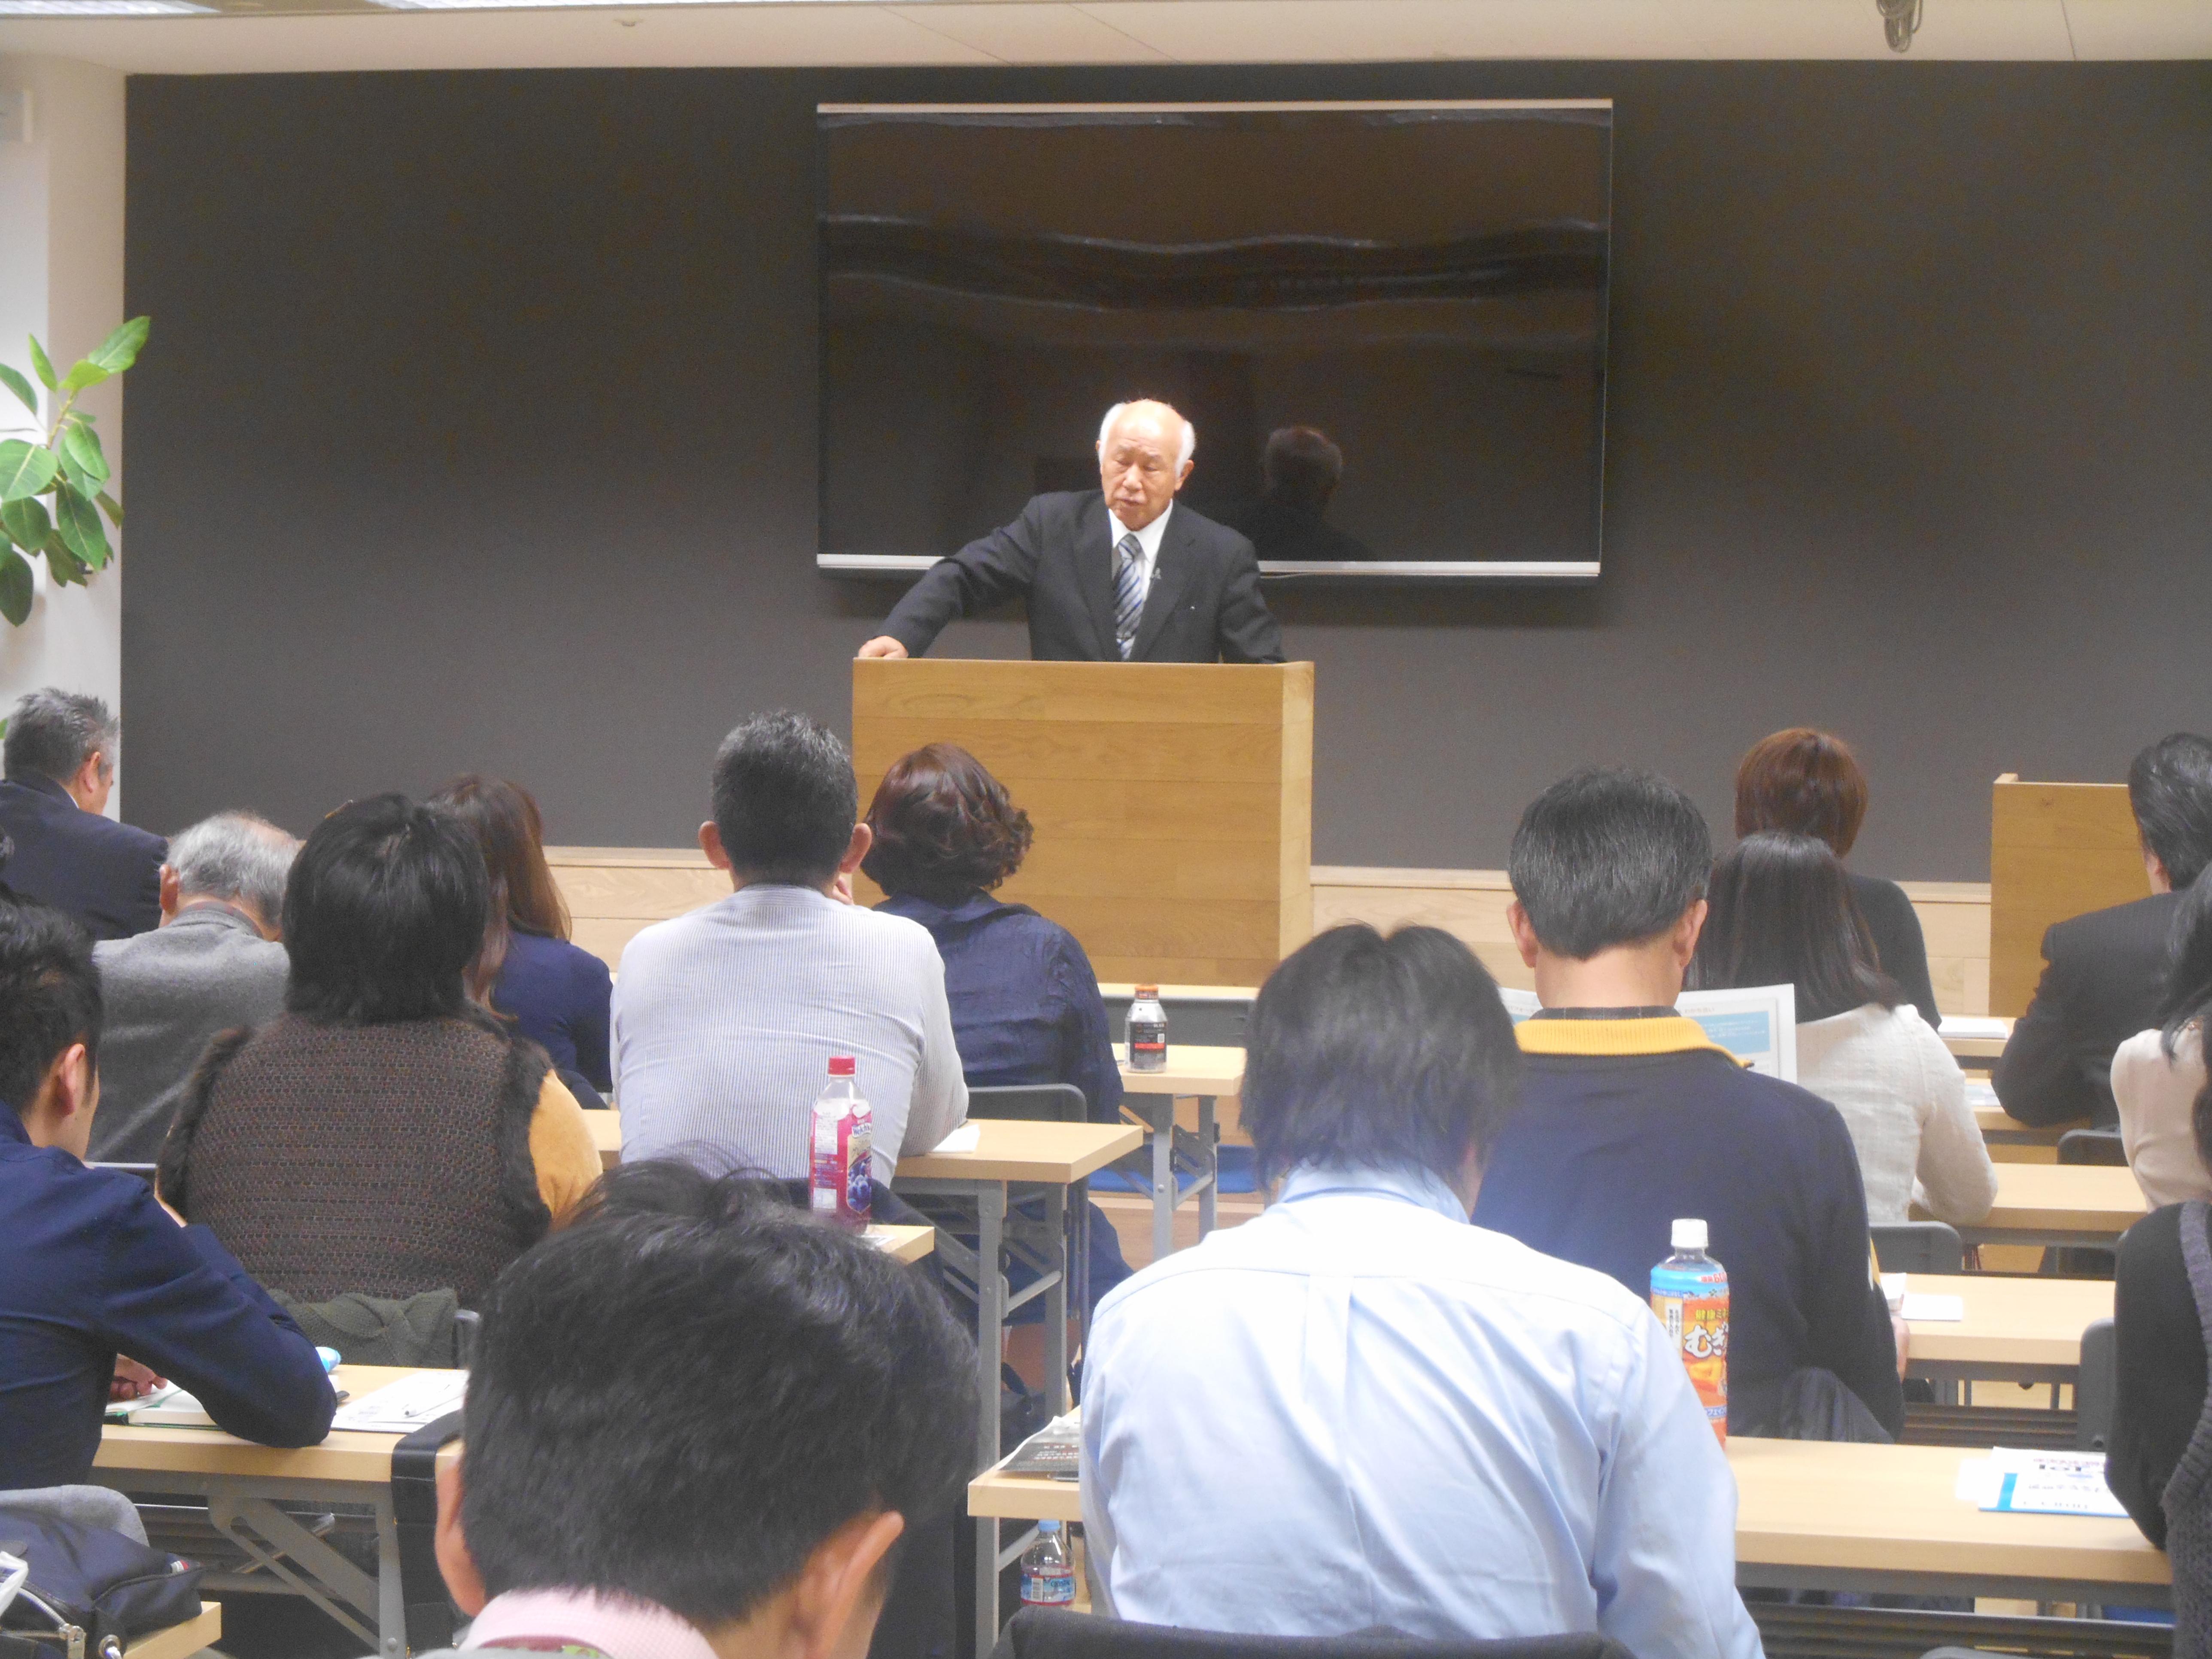 DSCN0455 - 平成30年度 東京思風塾 4月7日(土)「時代が問題をつくり、問題が人物をつくる」